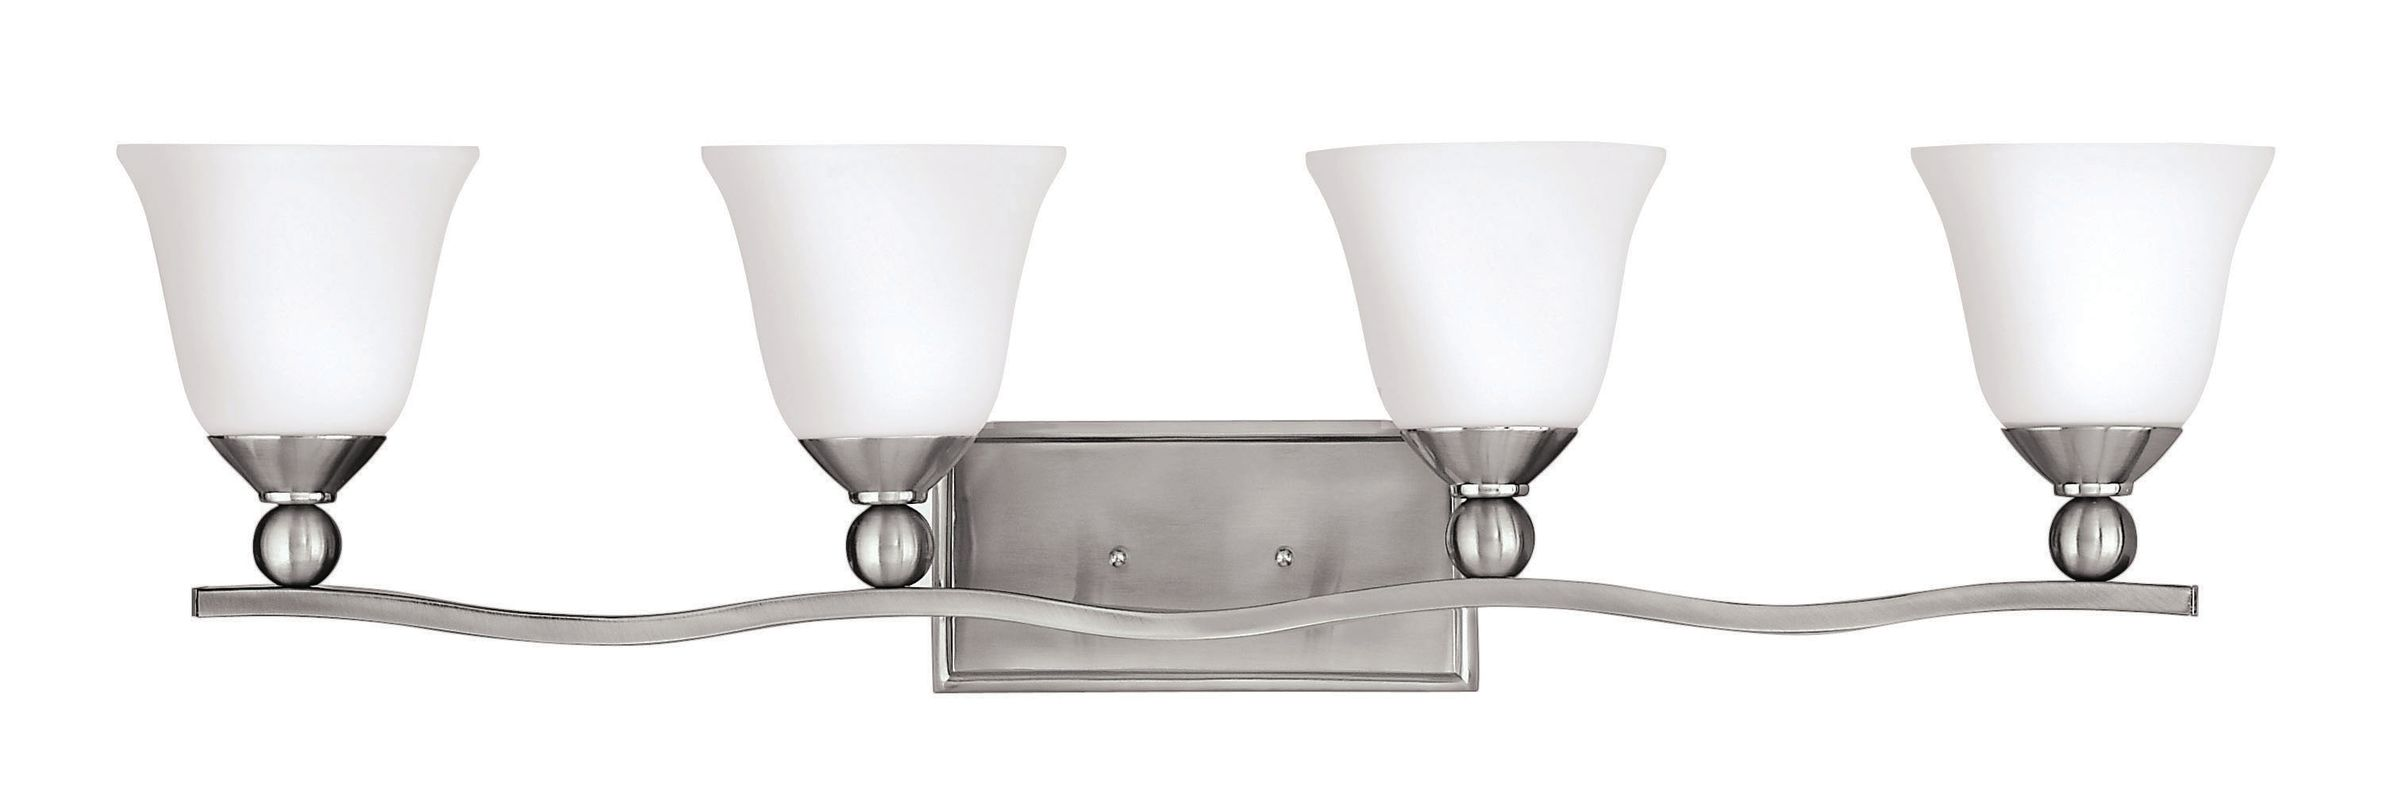 Hinkley Lighting 5894-GU24 4 Light Title 24 Fluorescent Bathroom